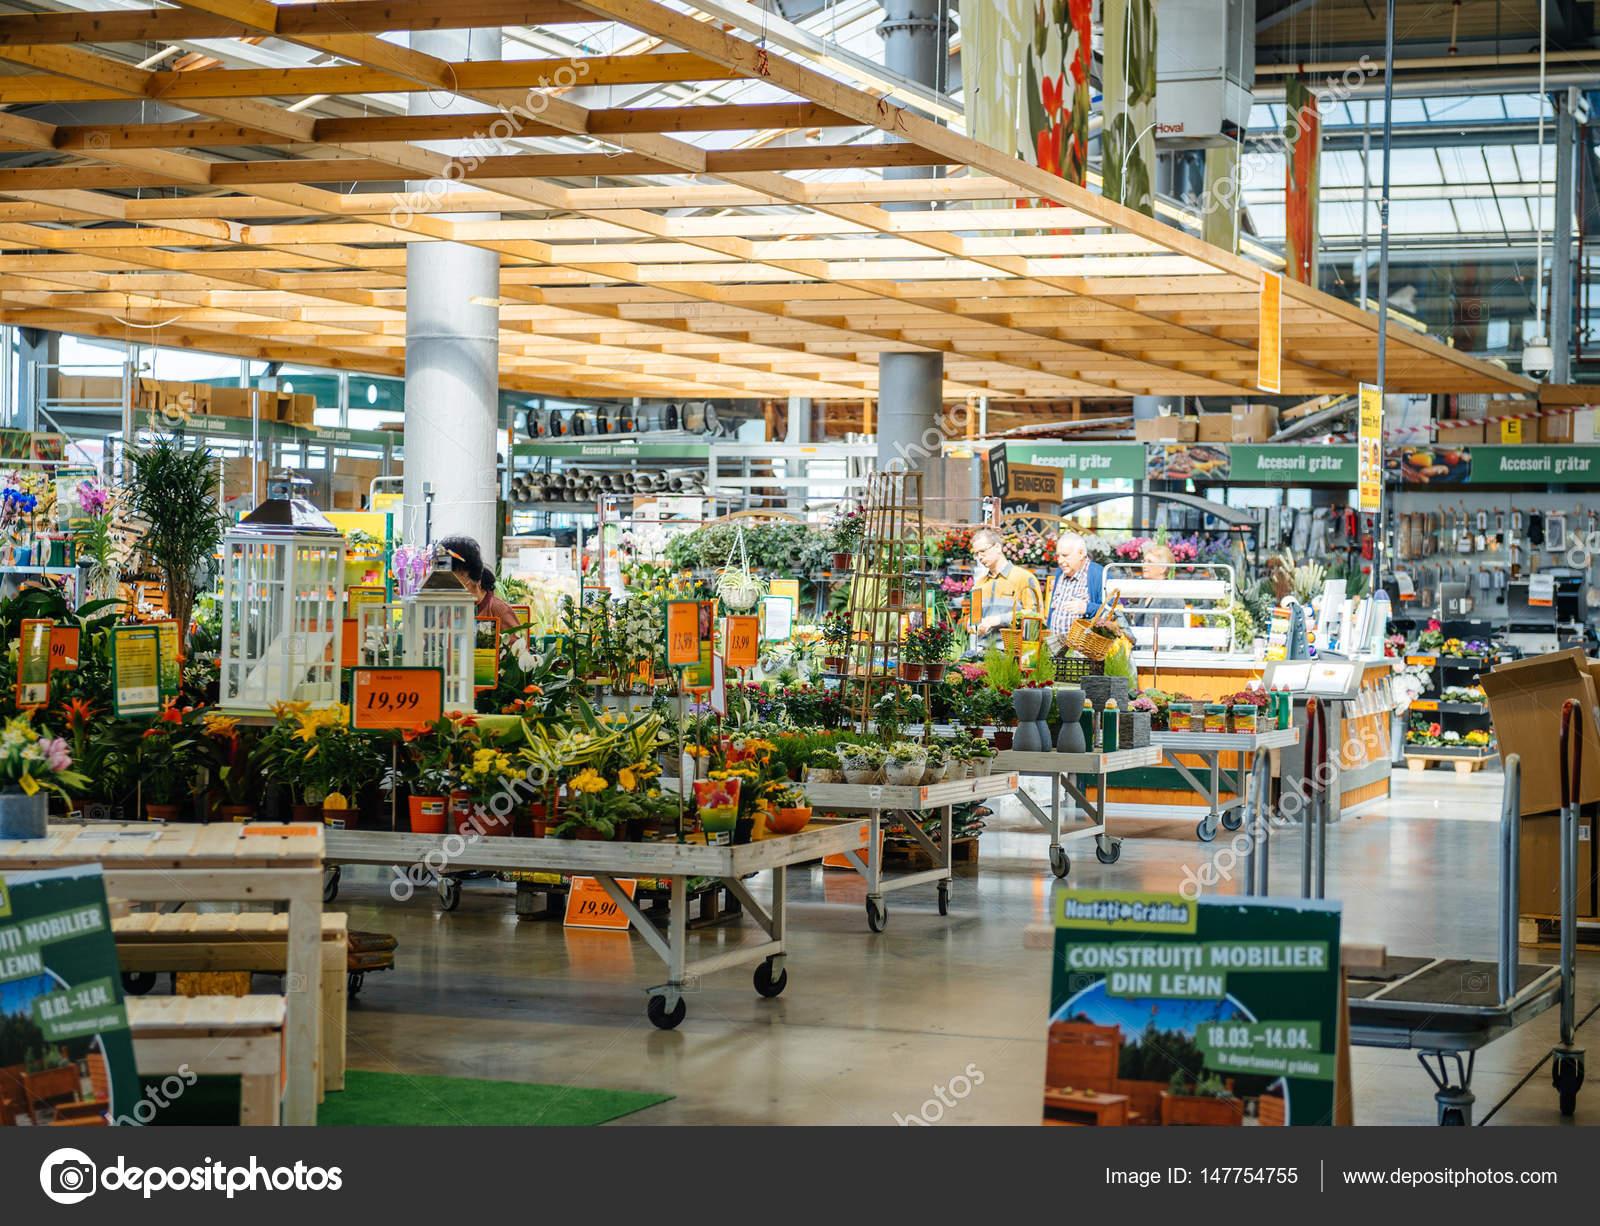 Man Buying Flowers For Garden At Hornbach Diy Store With ... concernant Hornbach Jardin